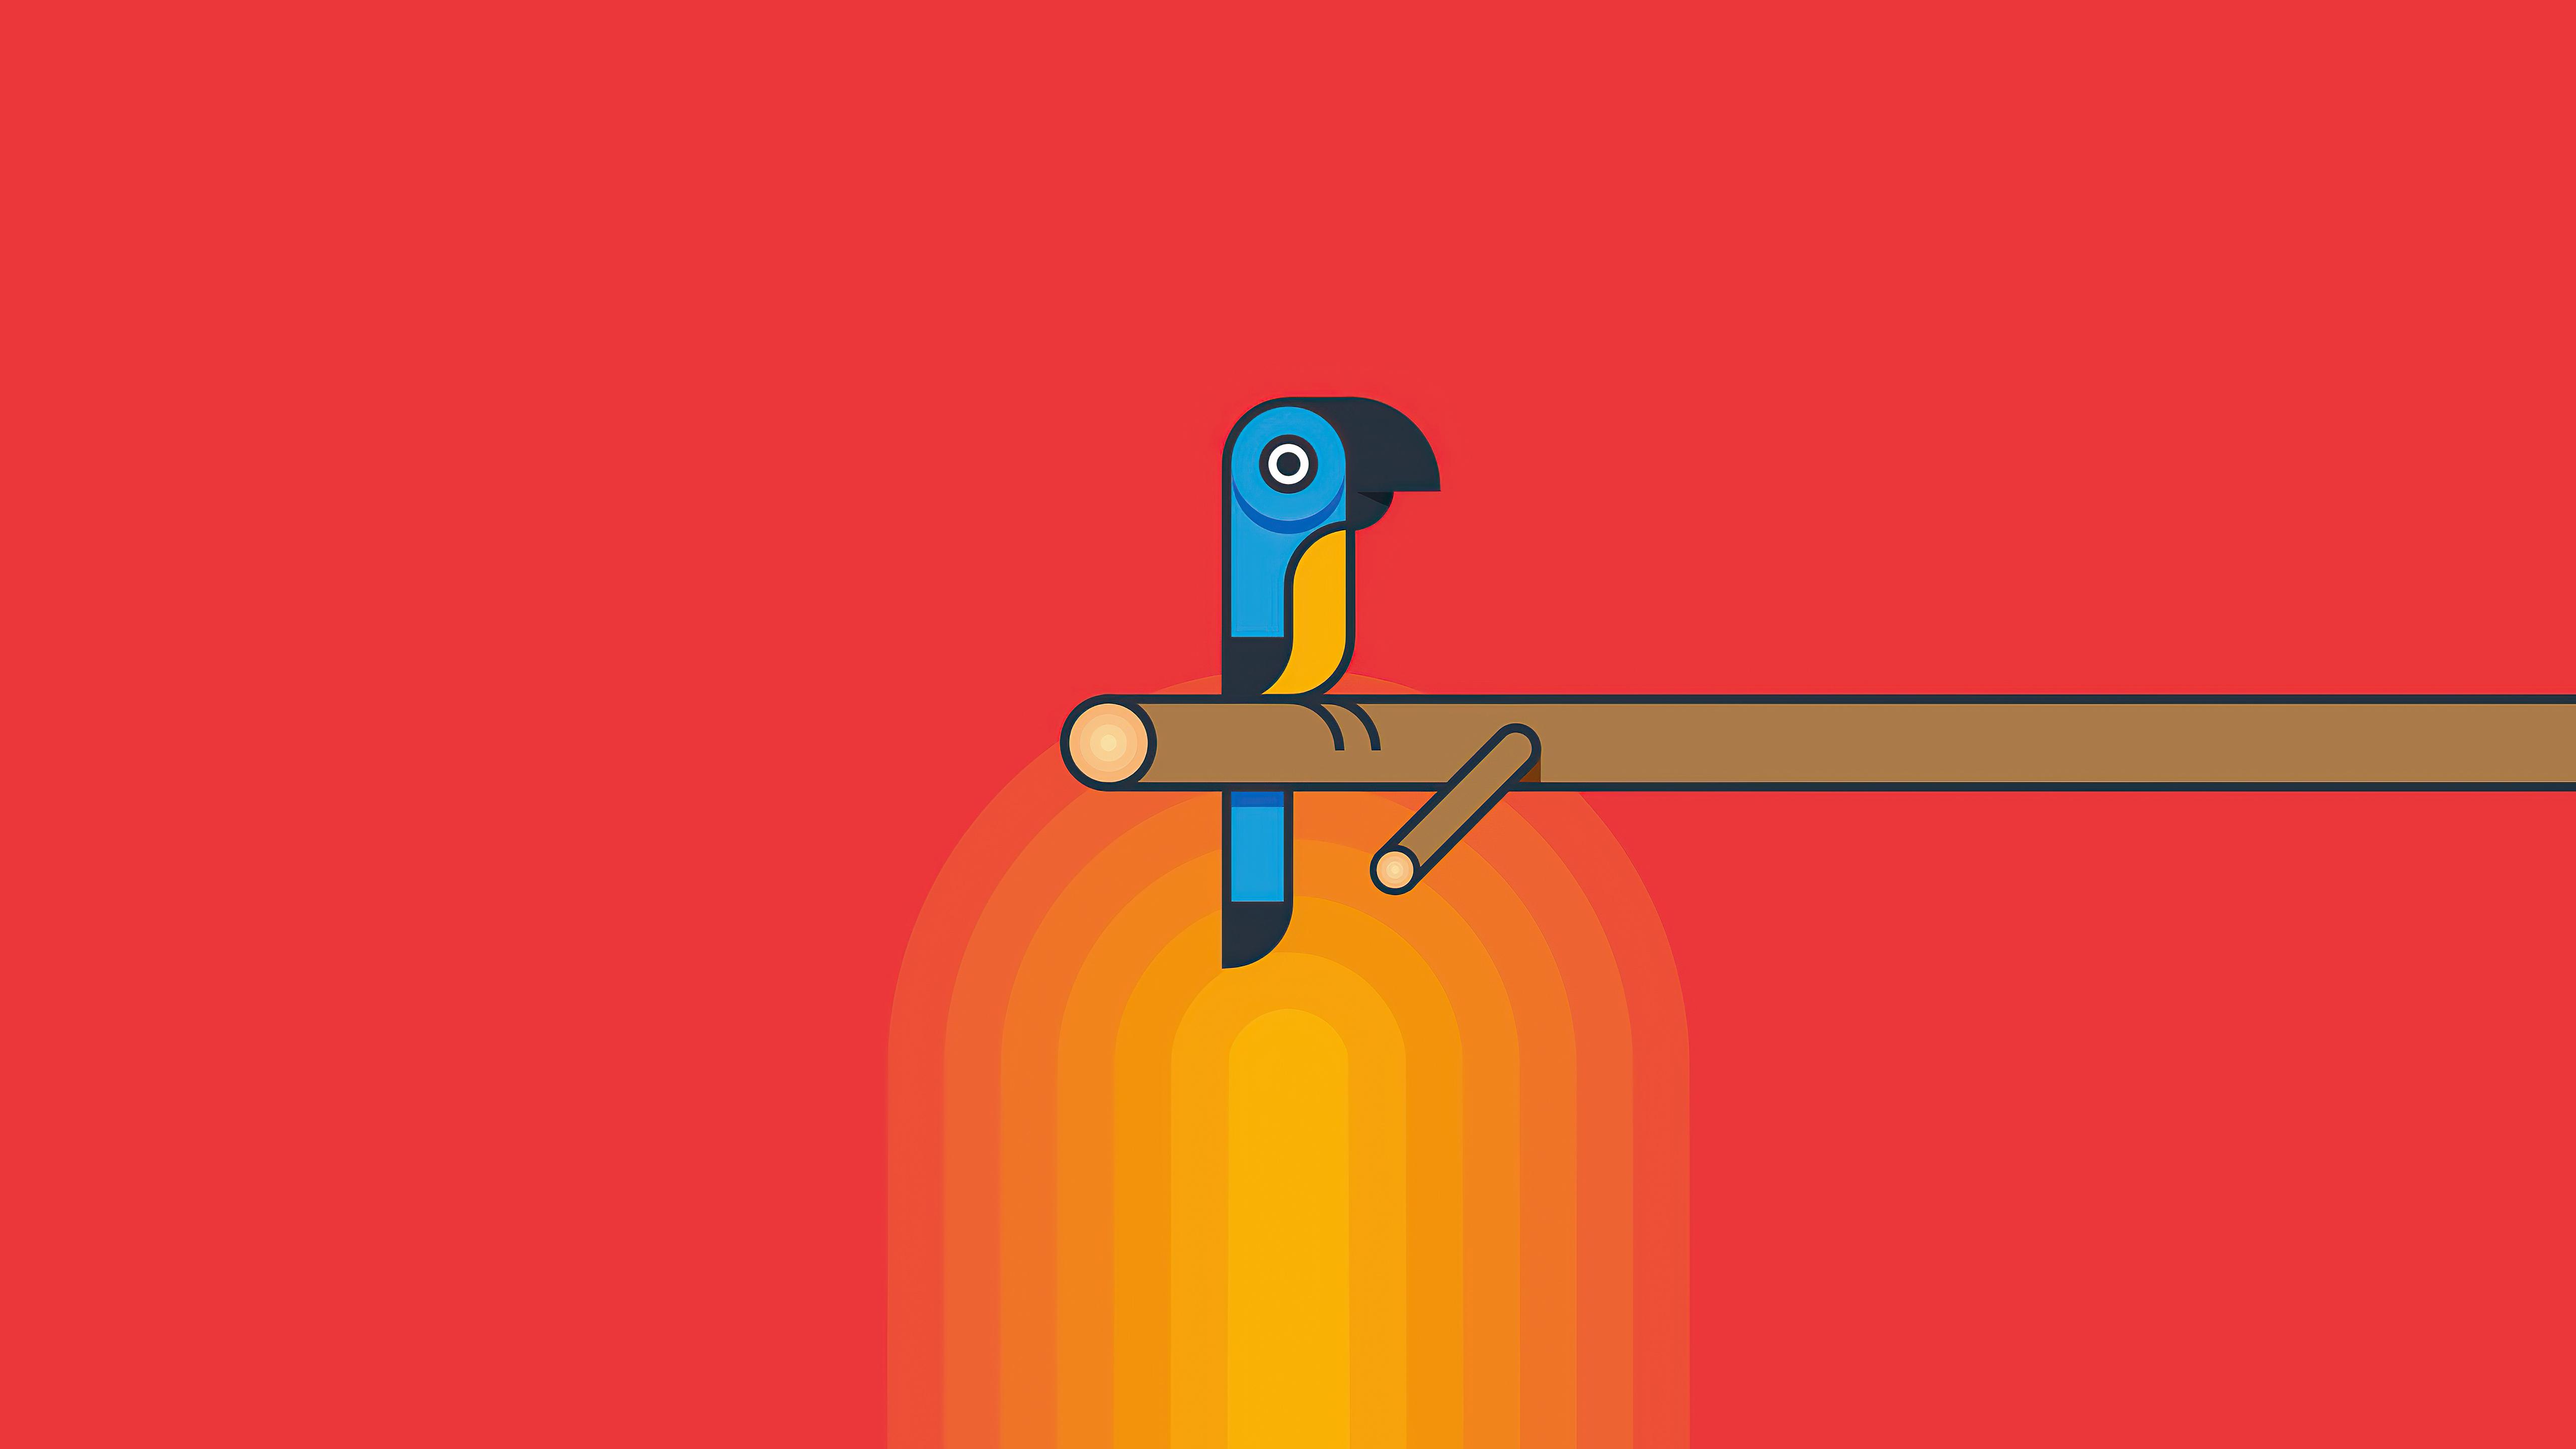 parrot-minimalism-5k-nz.jpg